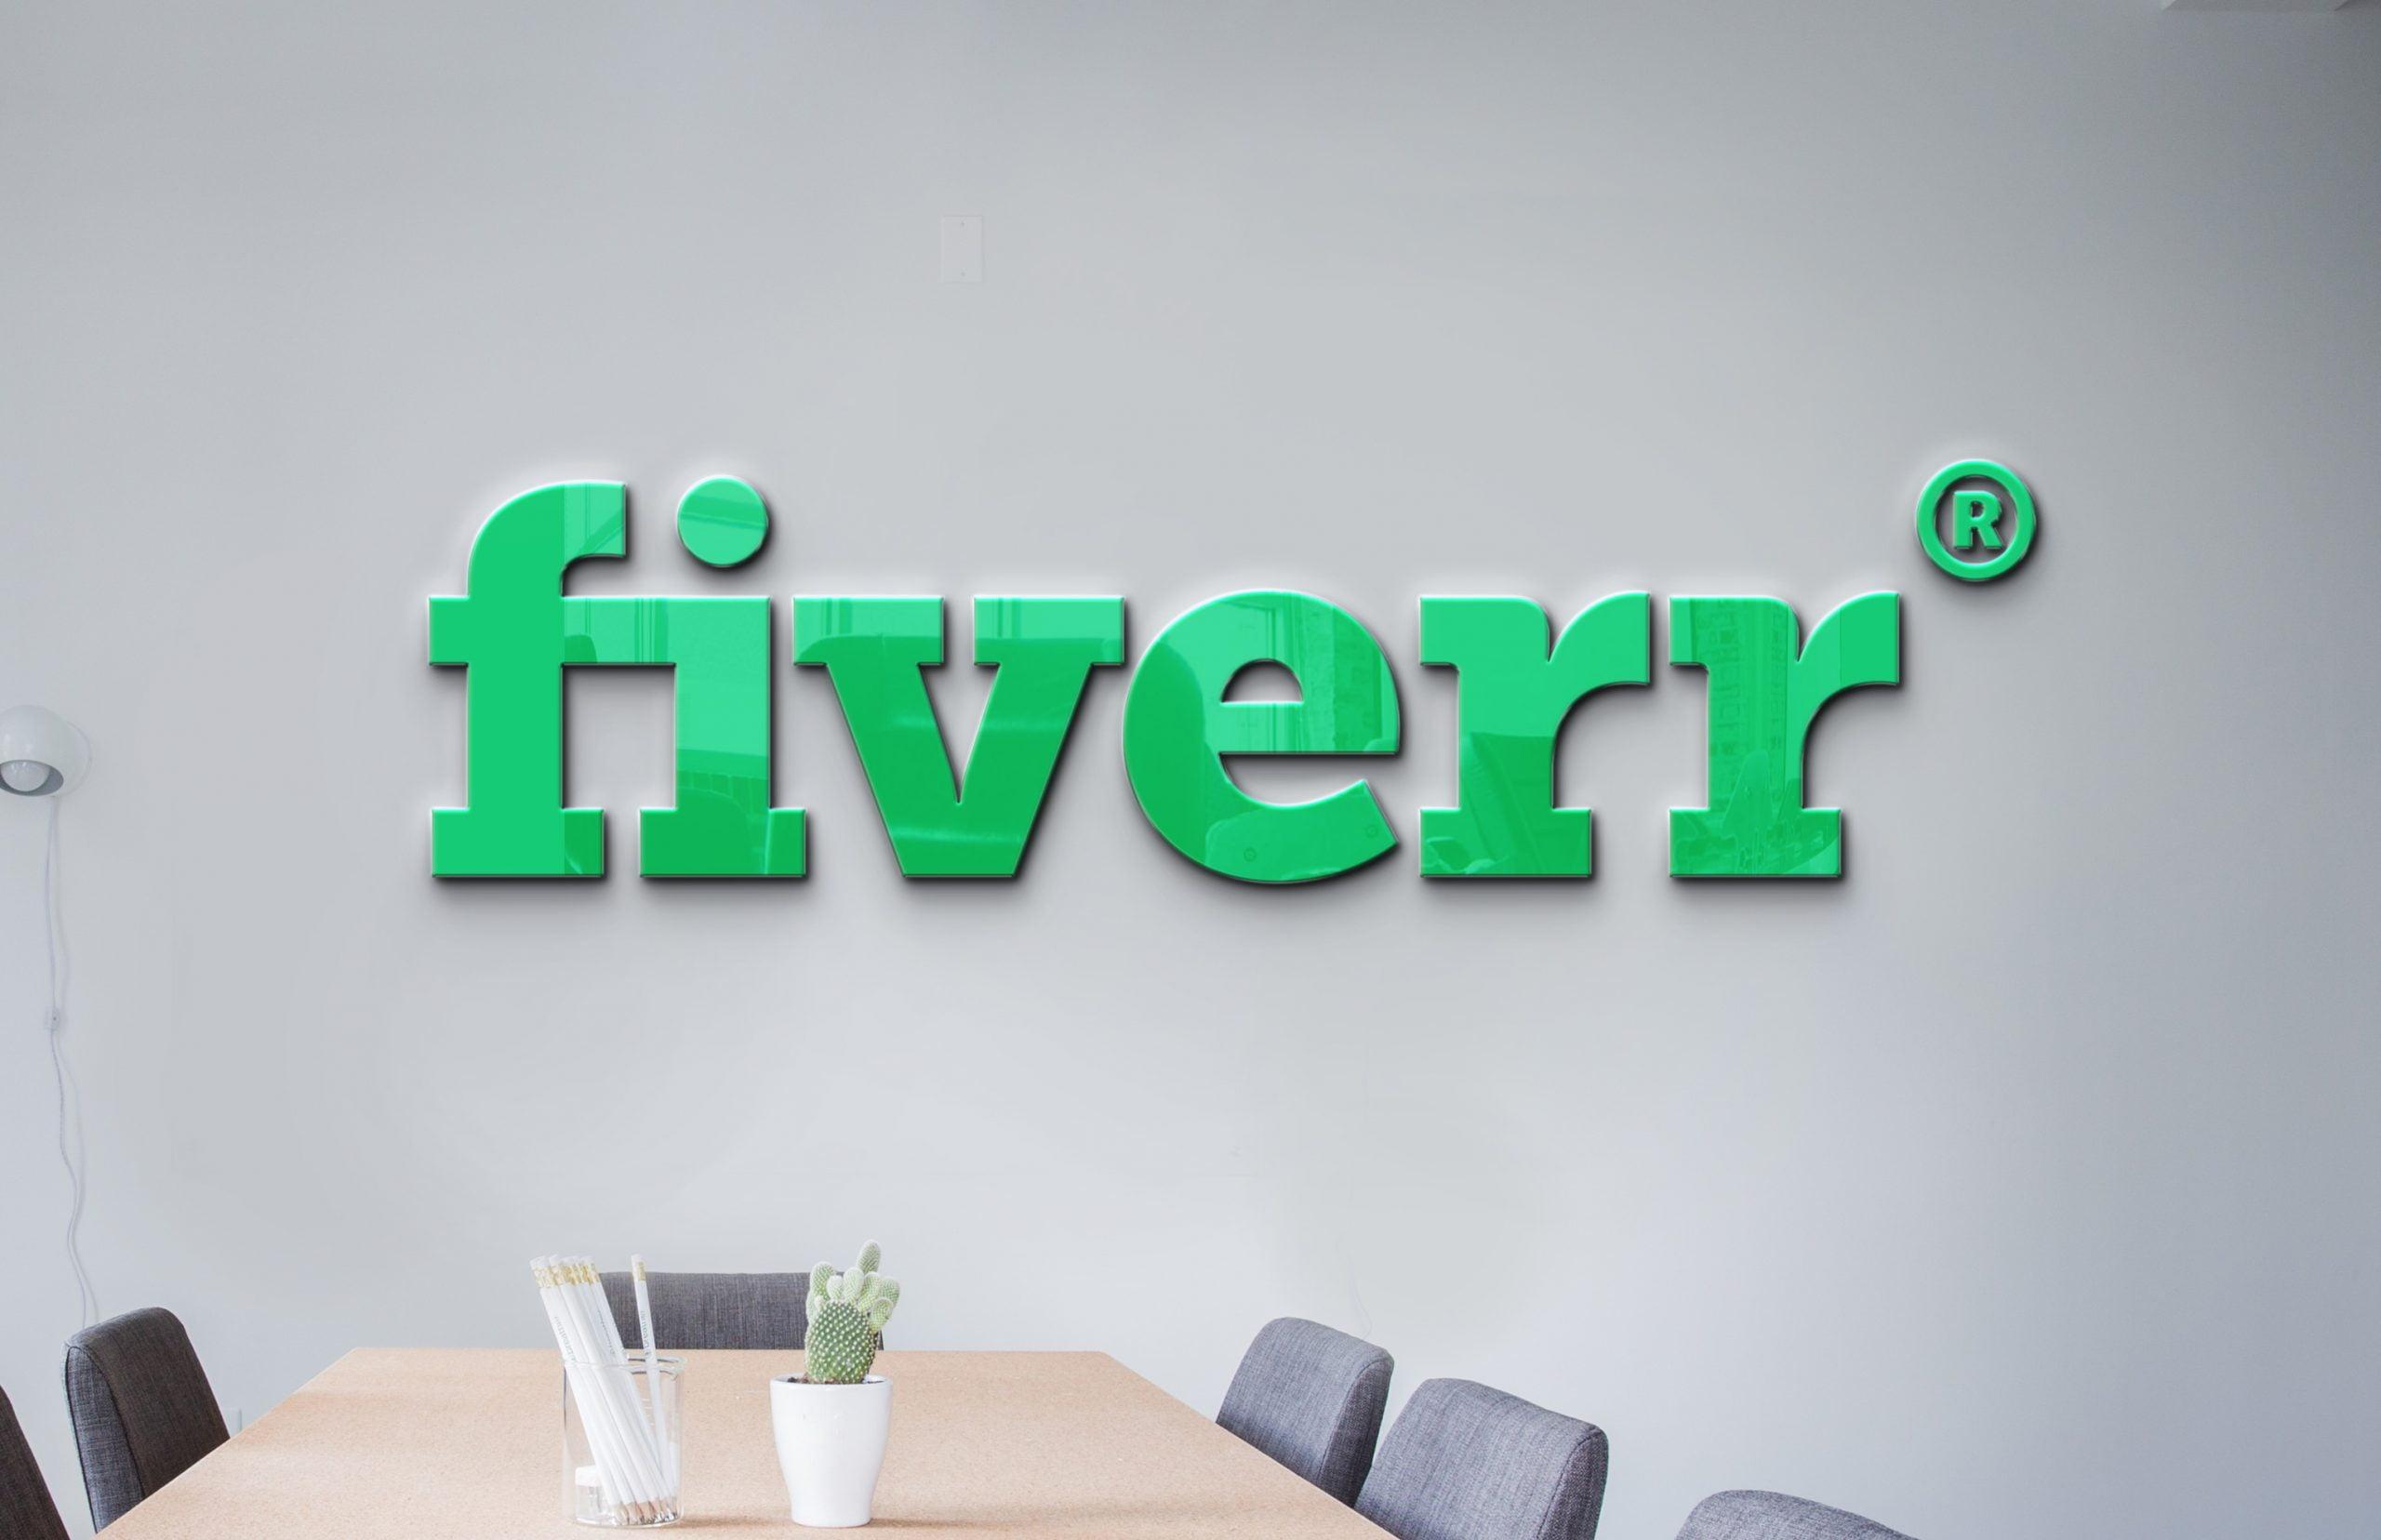 Free-Fiverr-Company-Free-Conference-room-logo-mockup